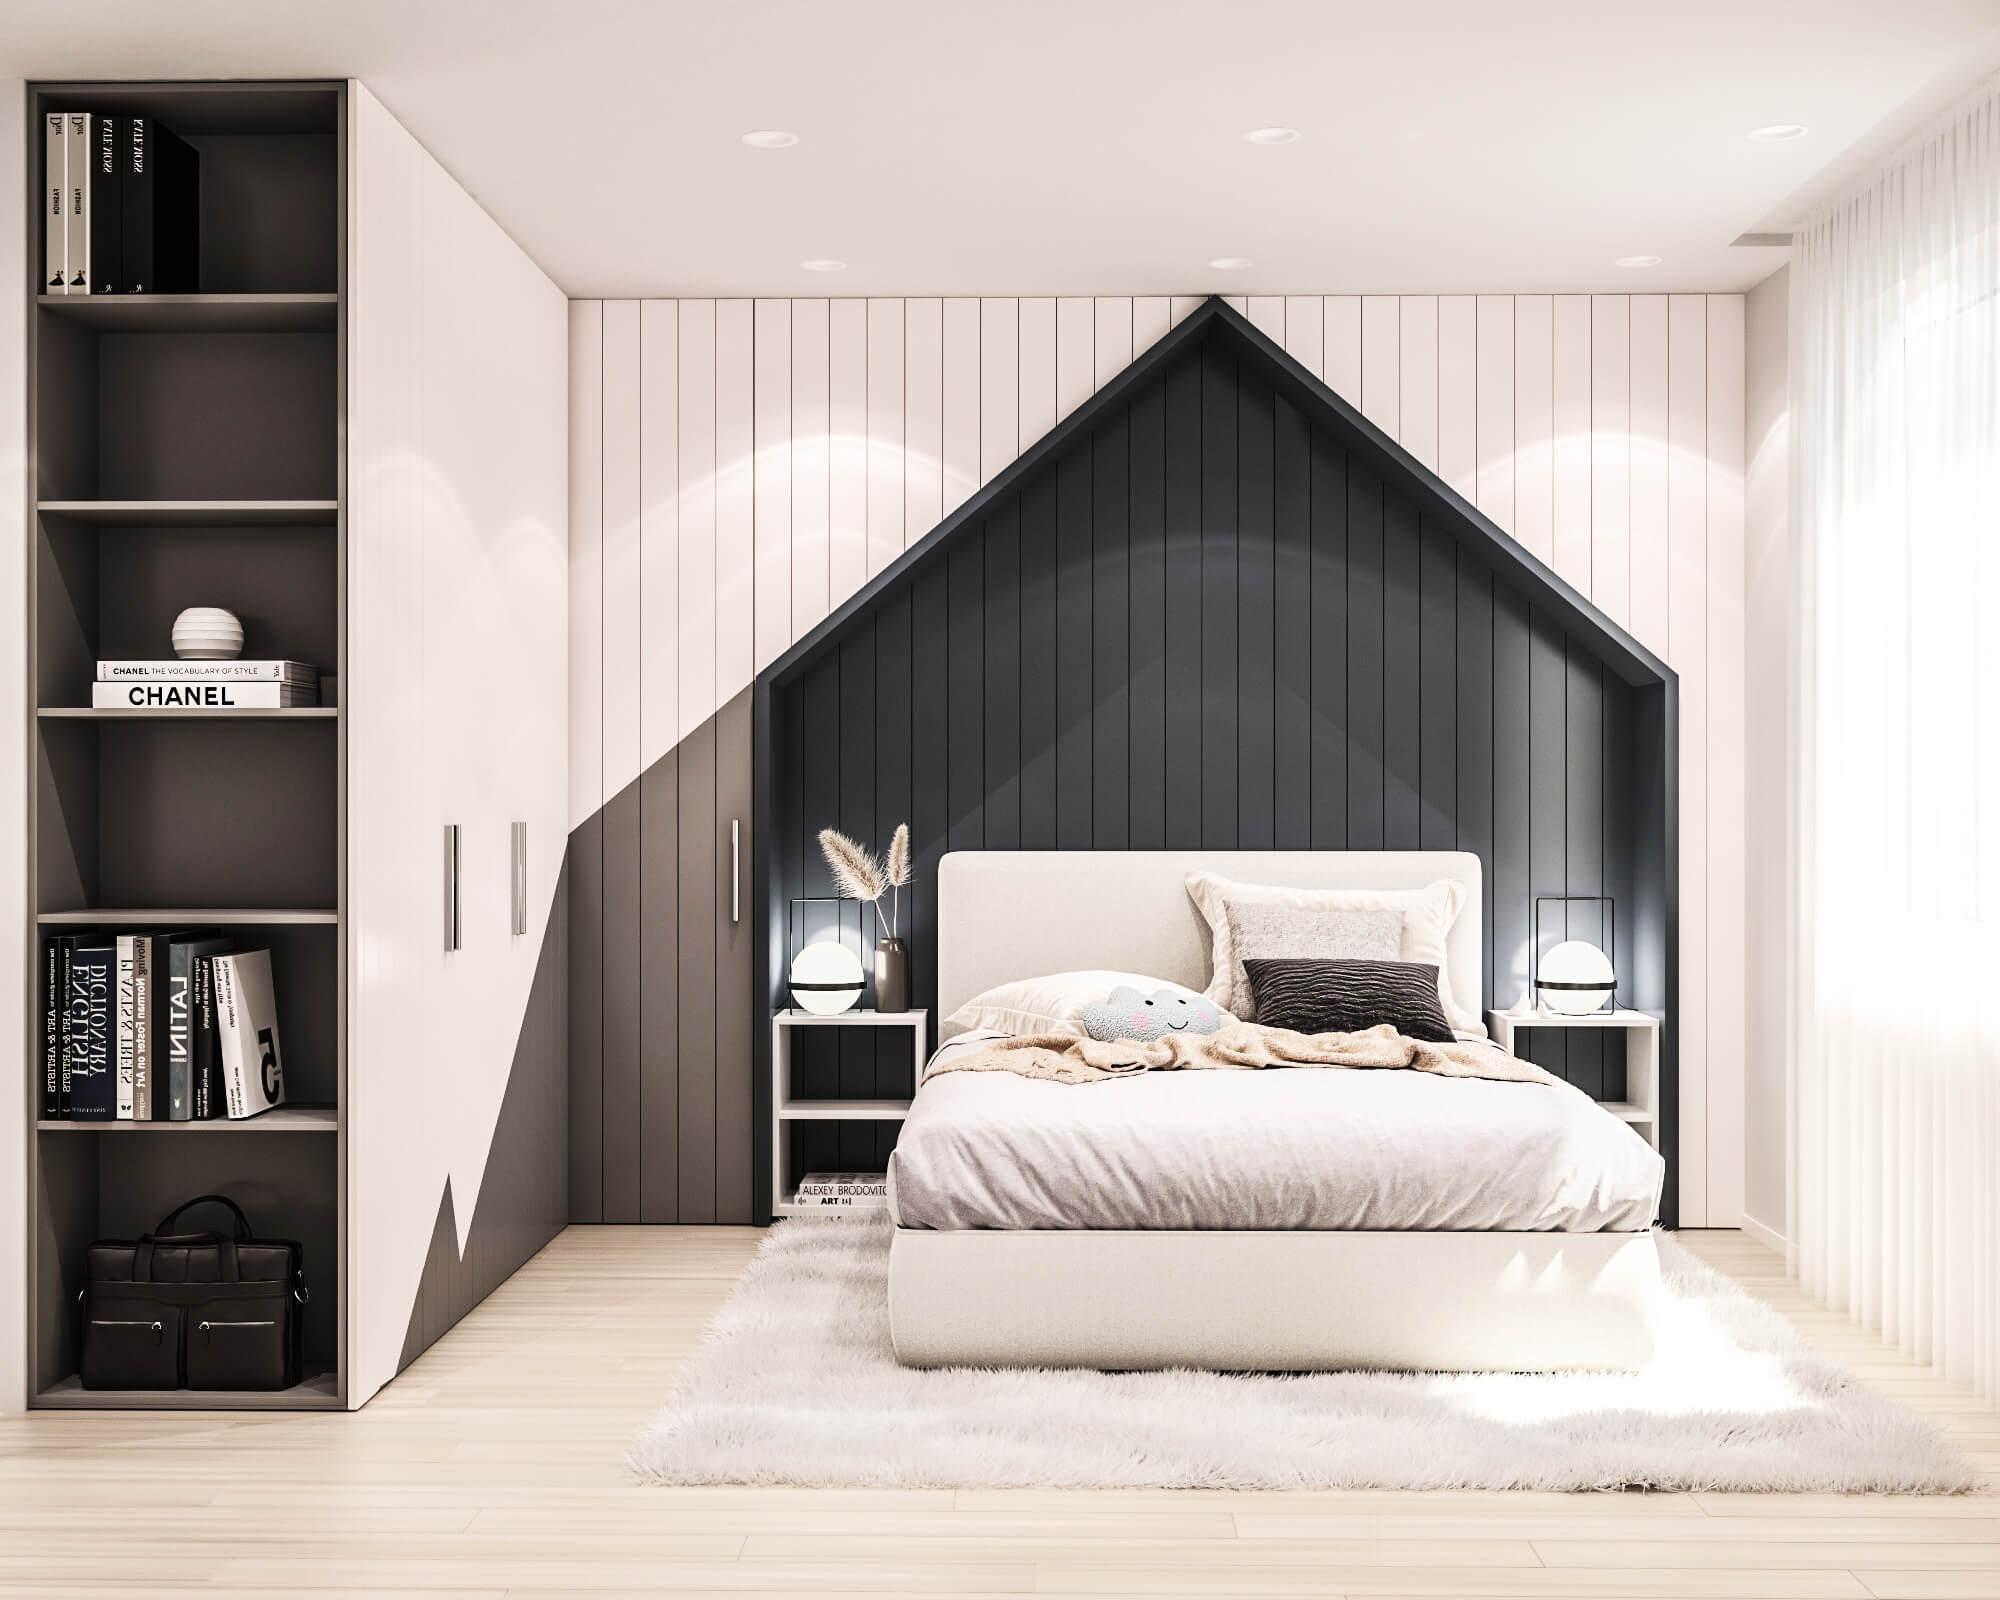 interioren-dizain-proekt-na-detska-staya-interioren-proekt-blu